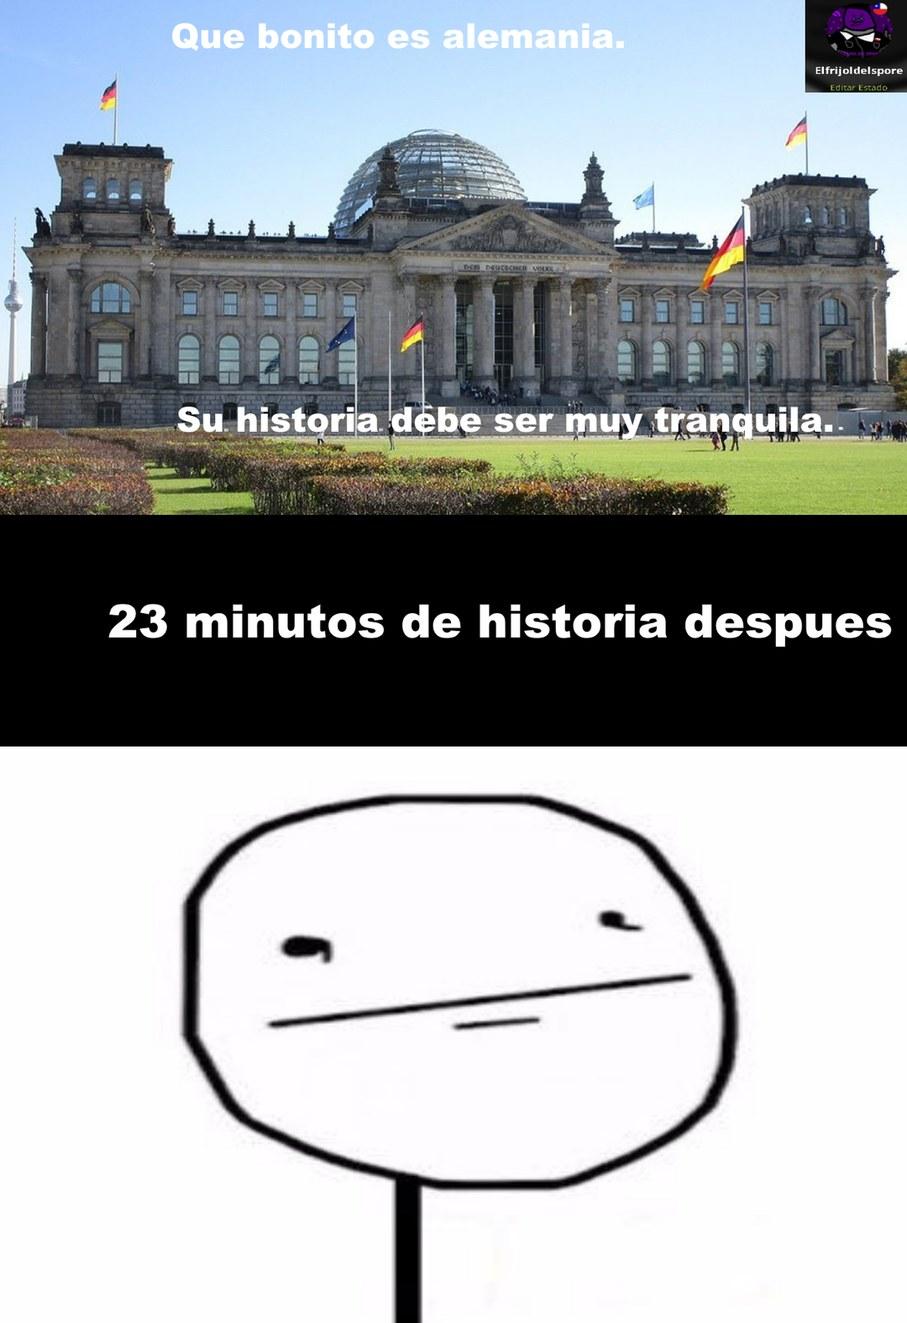 Nazi, imperio aleman, prussia ect de todas maneras, mi 3 meme que va